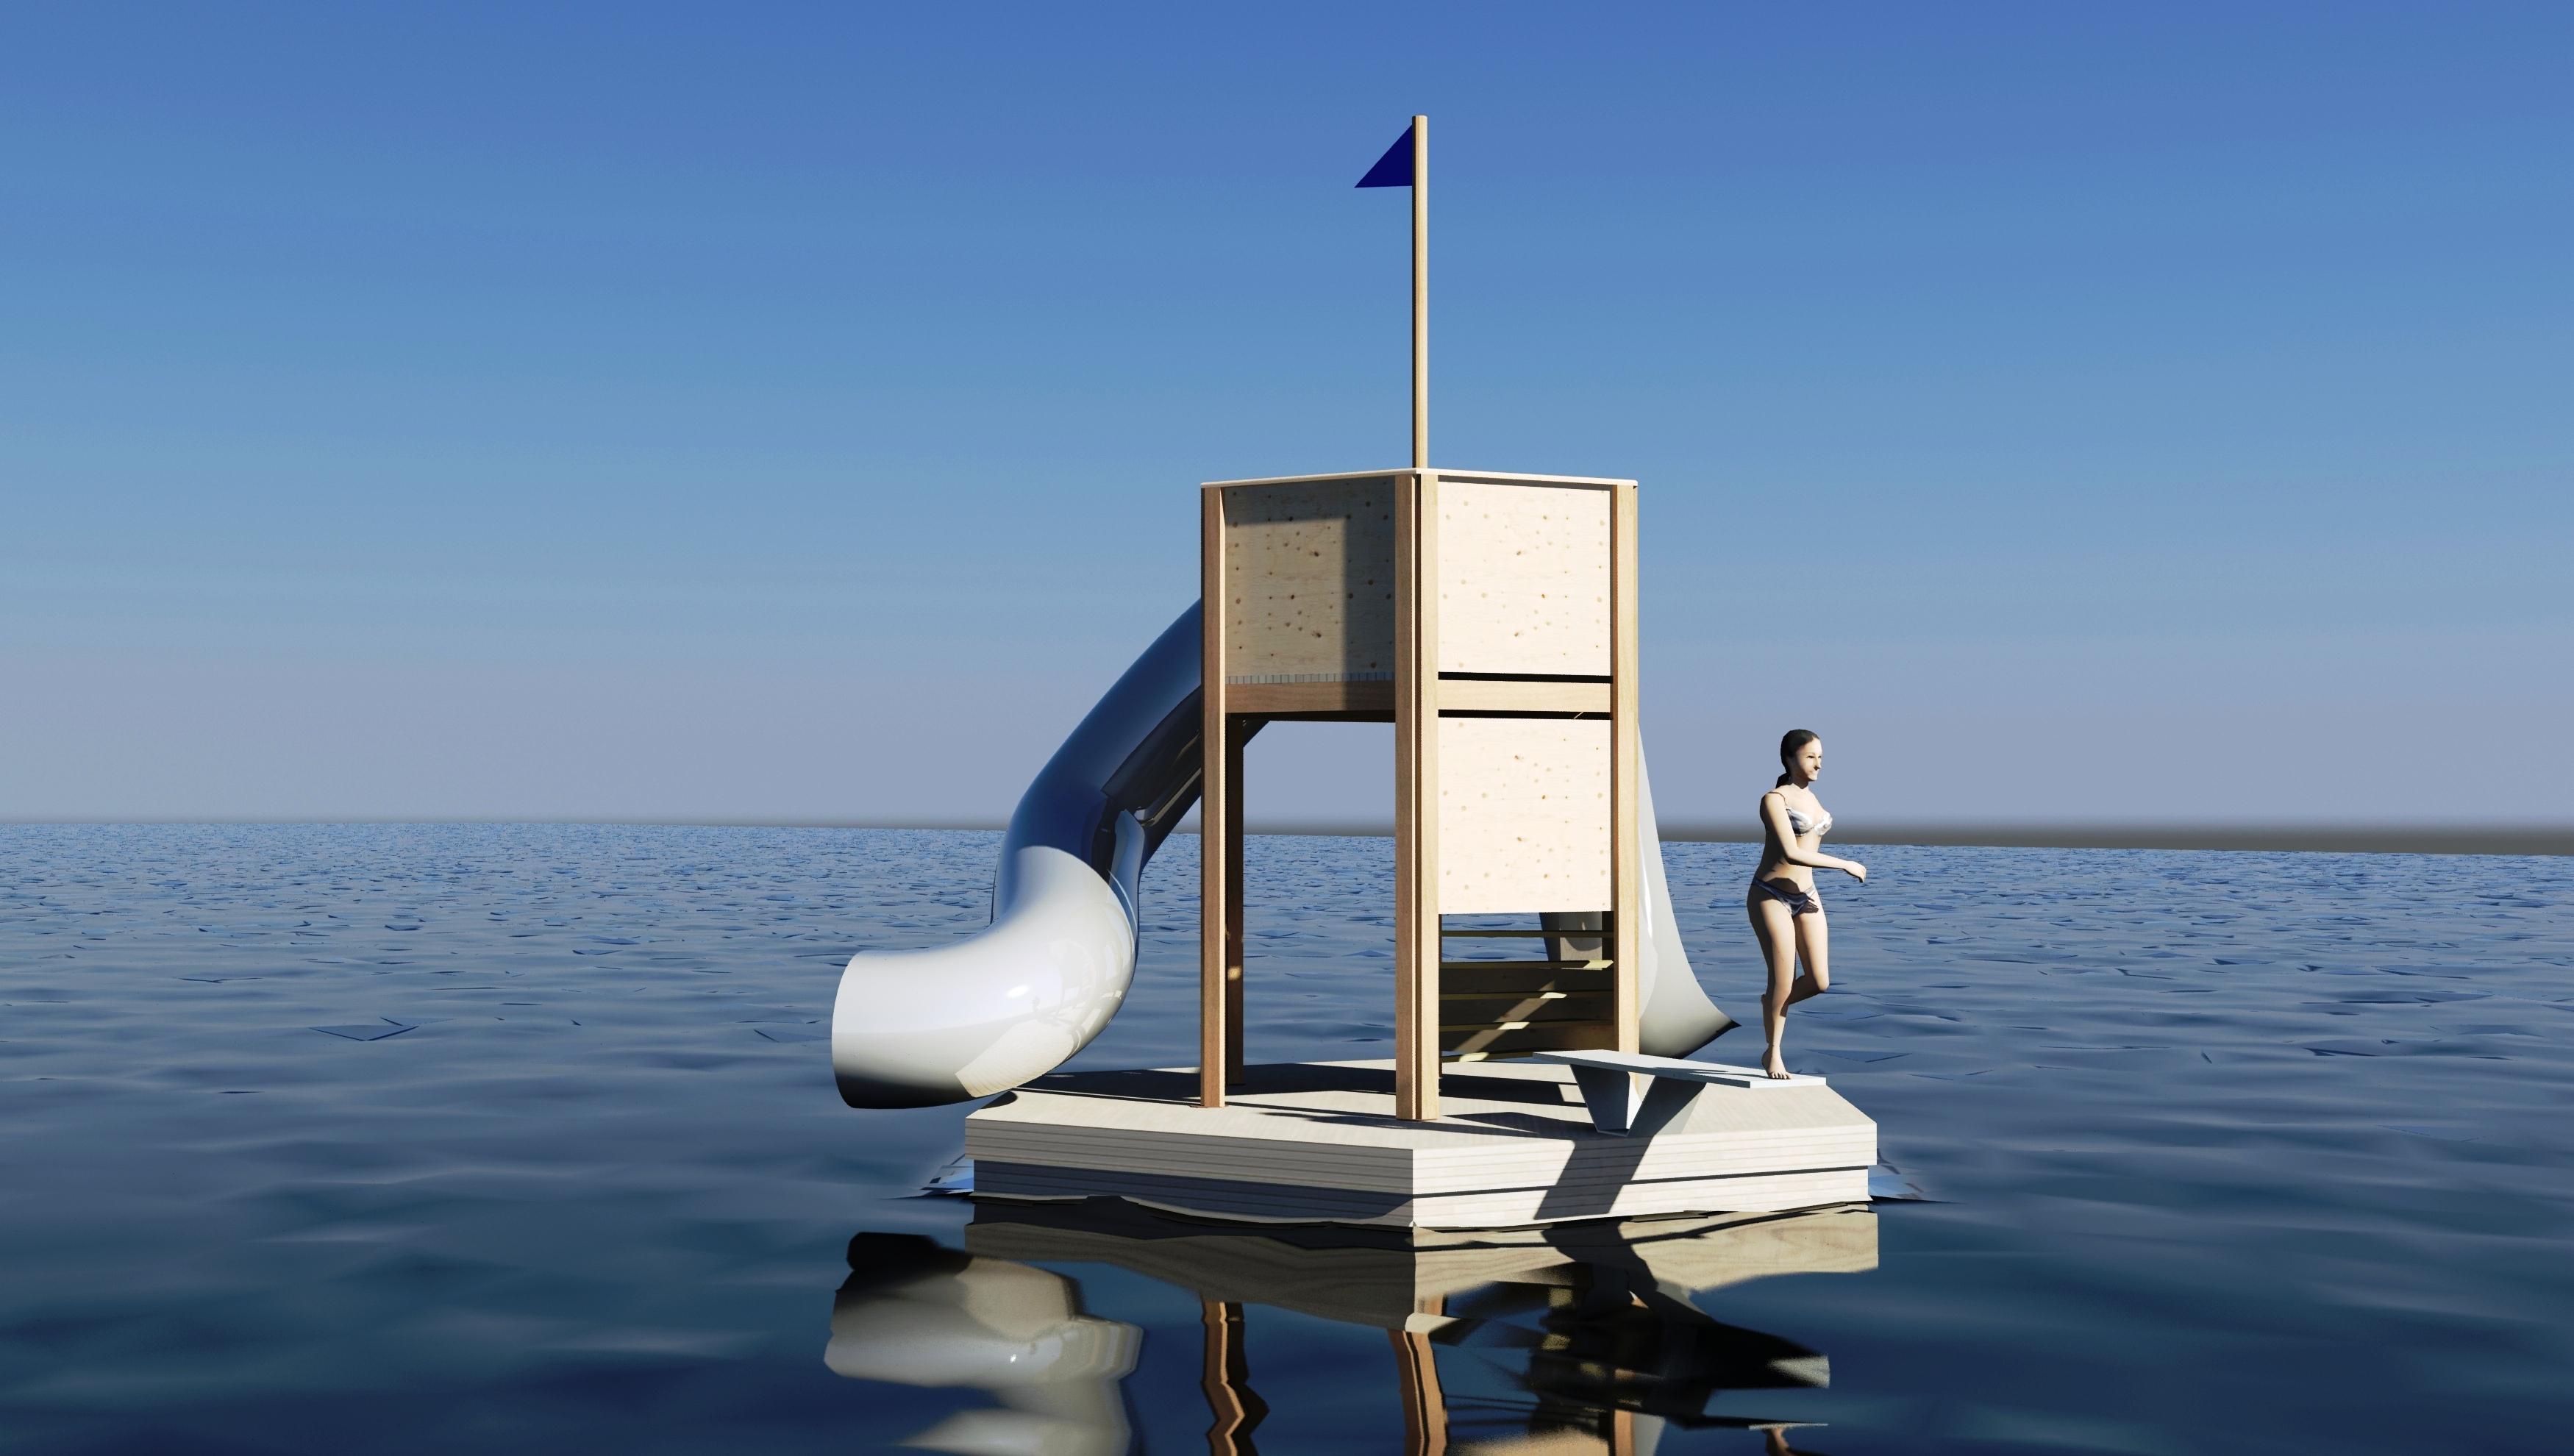 concept plate-formes flottantes